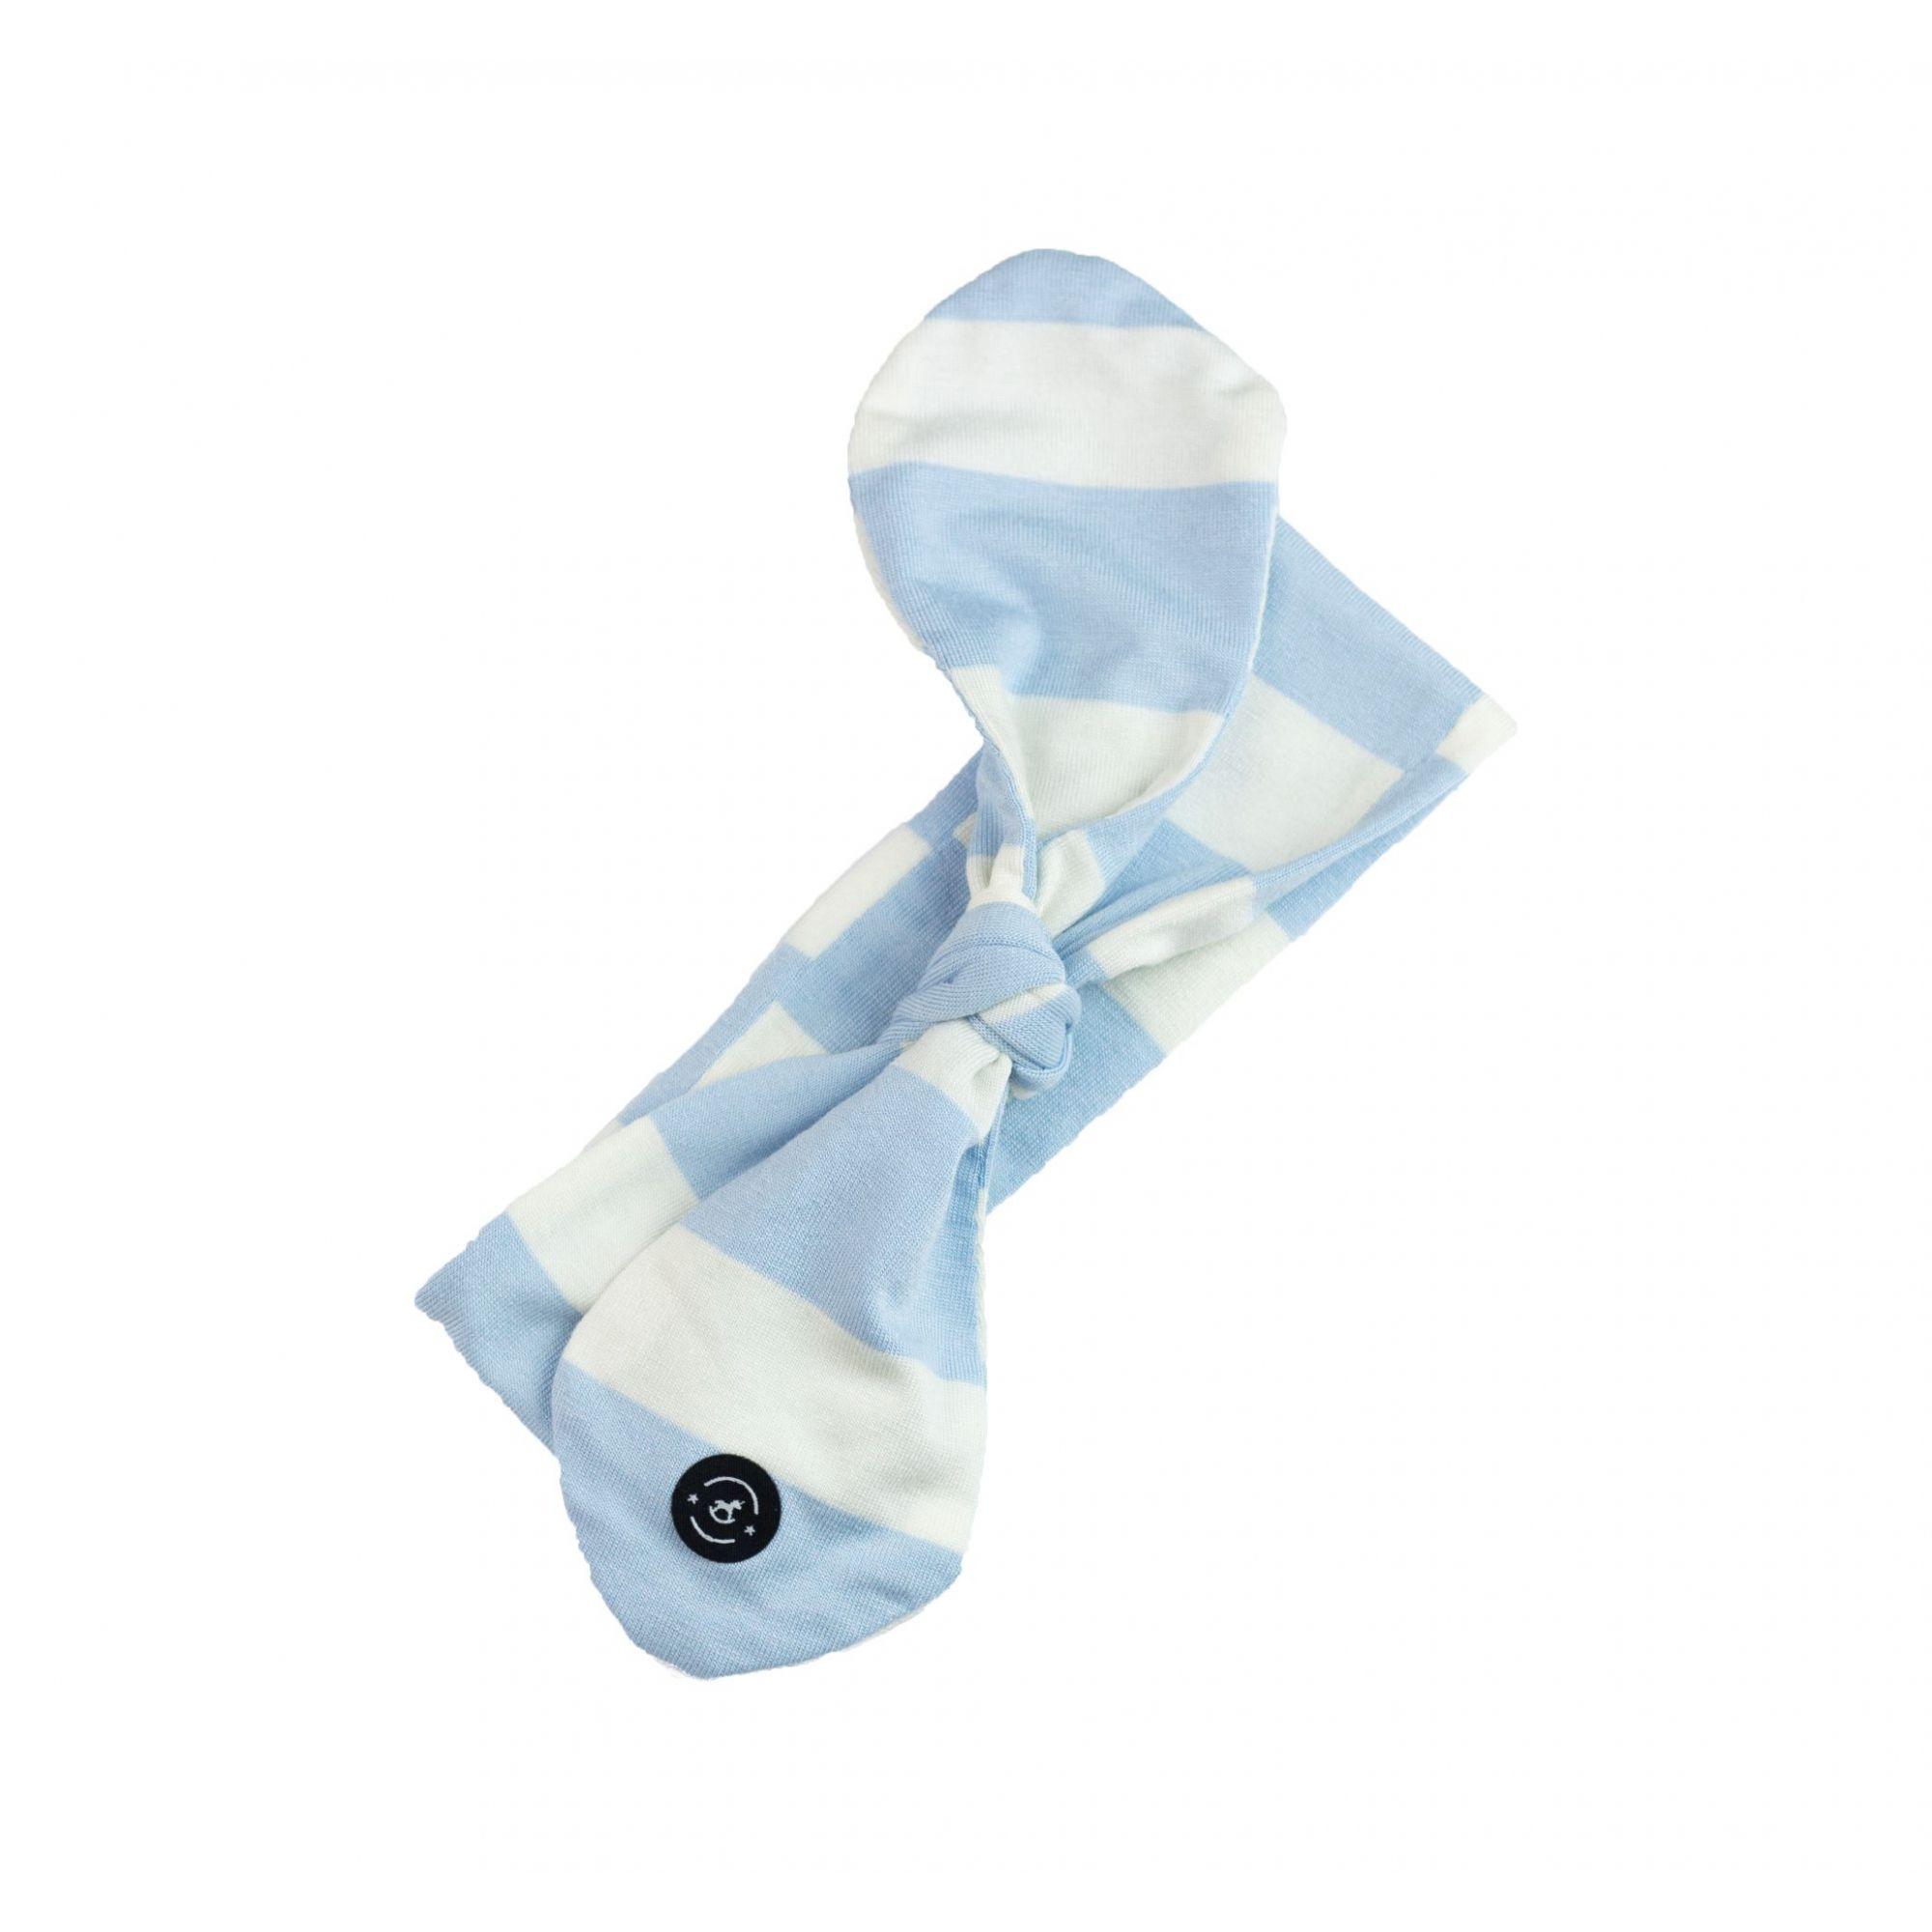 Faixa Knot Encantado (Listras - Azul Bebê/Branco) - Penka & Co.